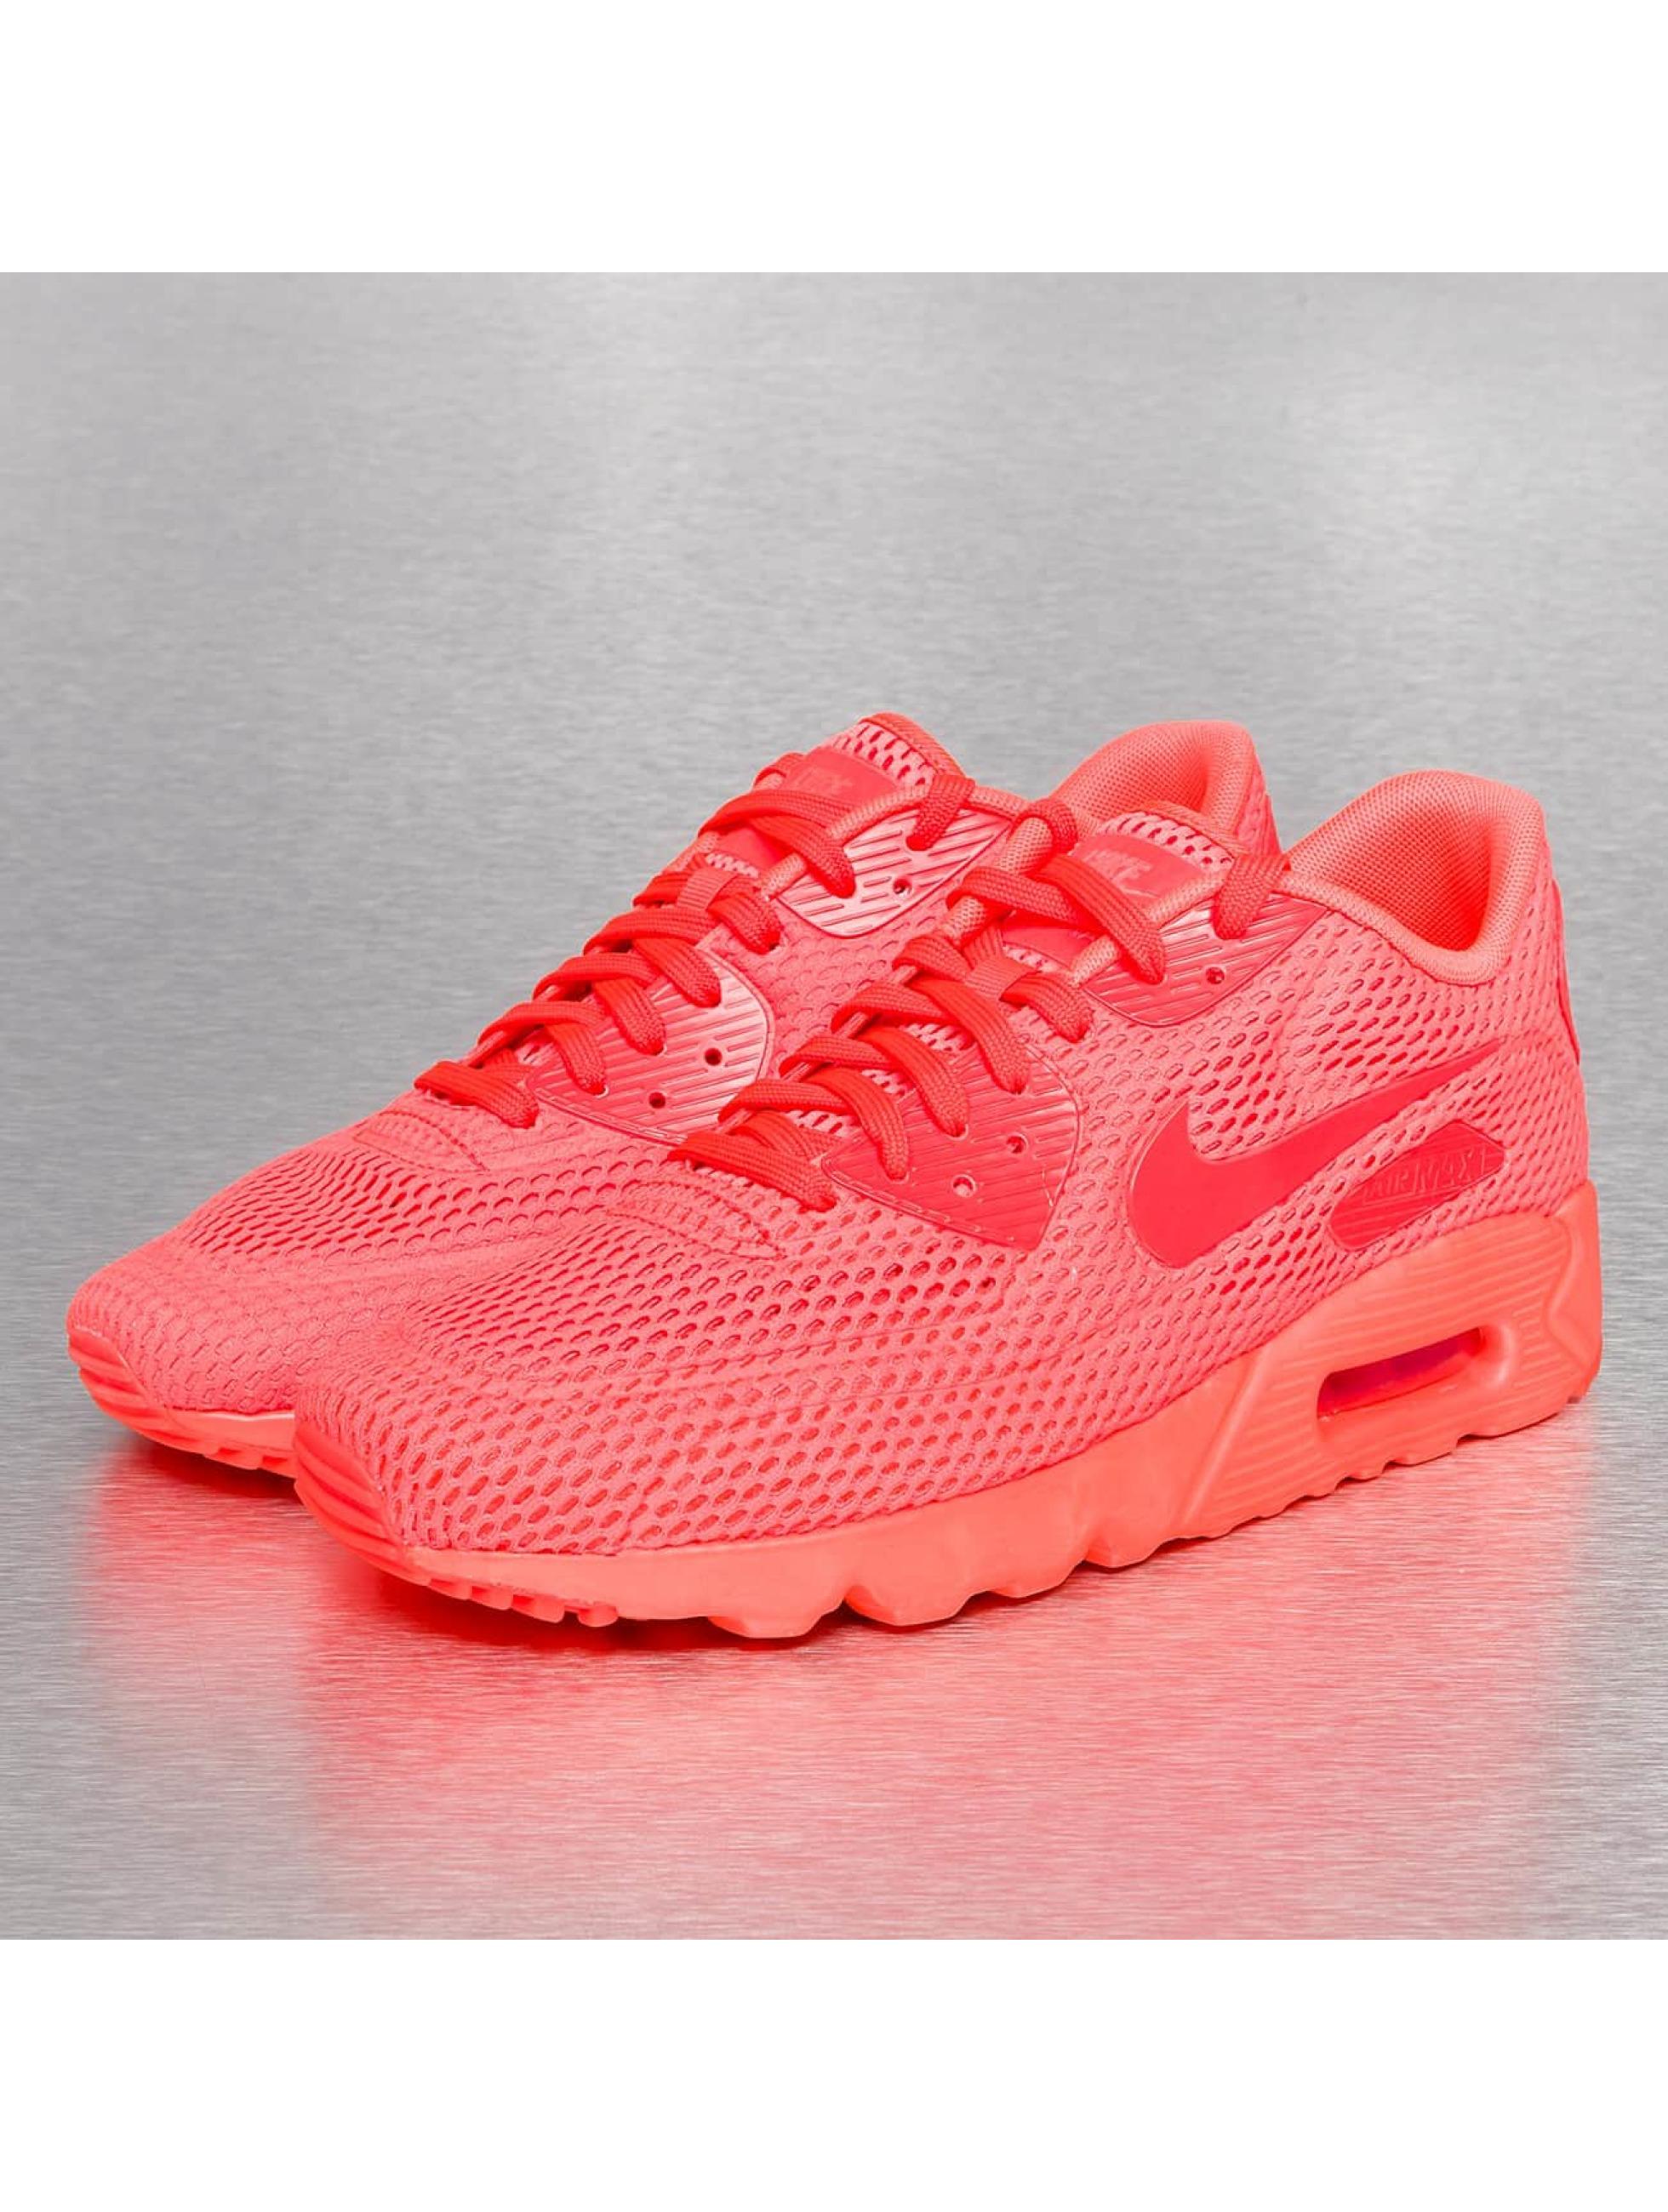 Nike Chaussures / Baskets Air Max 90 Ultra BR en orange